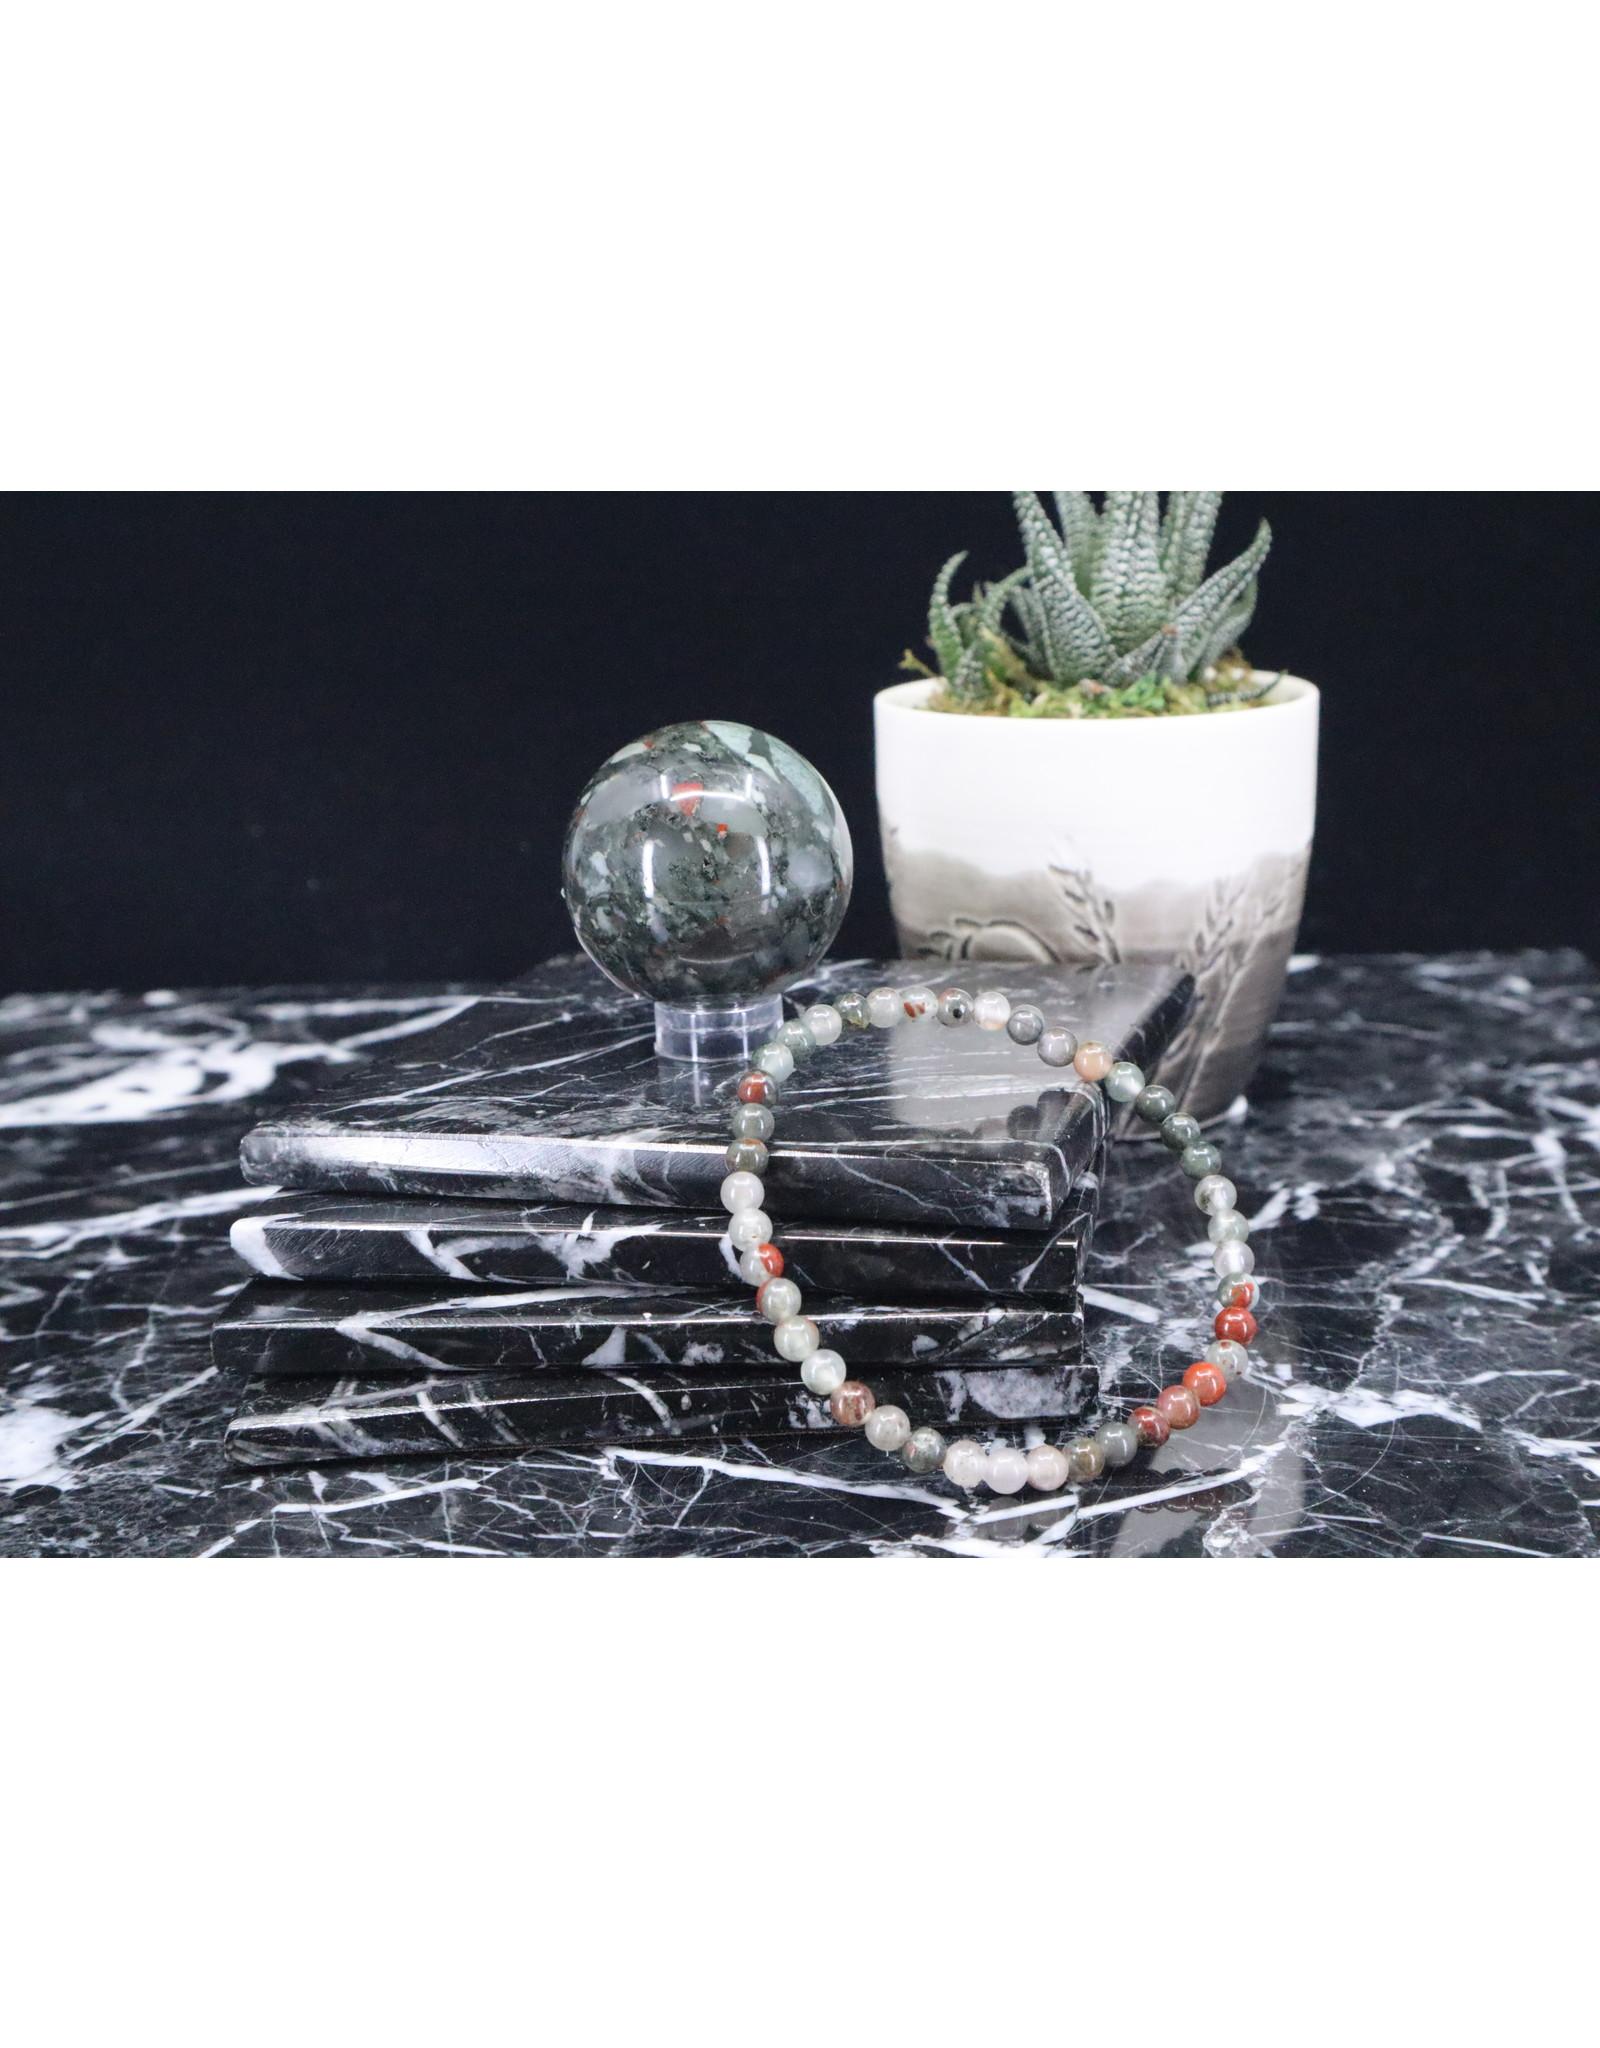 African Bloodstone/Seftonite Bracelet-4mm